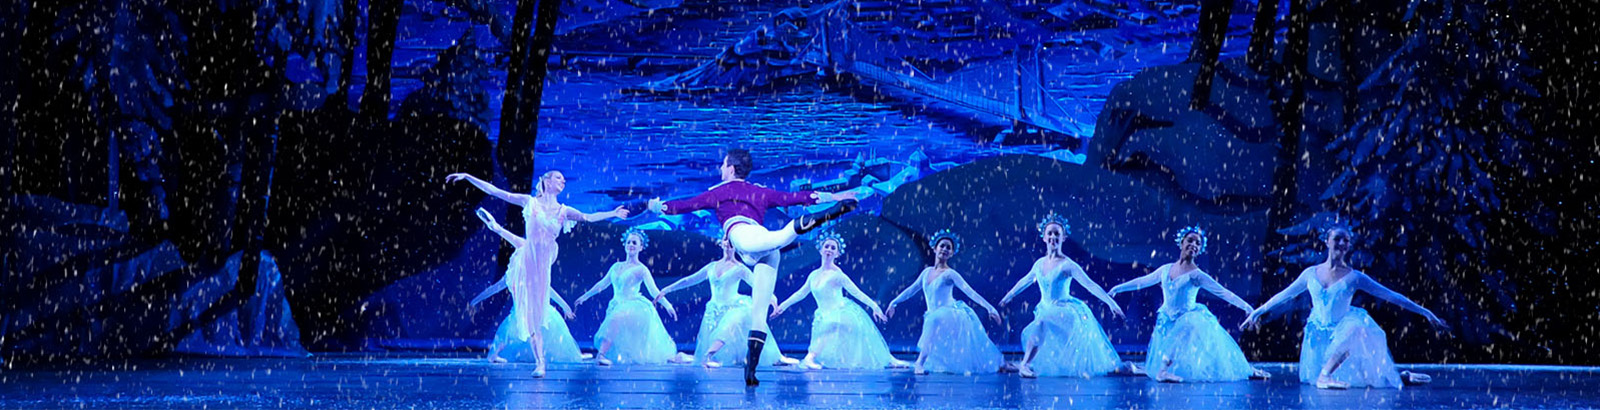 Snow Scene - Pittsburgh Ballet Theatre's The Nutcracker